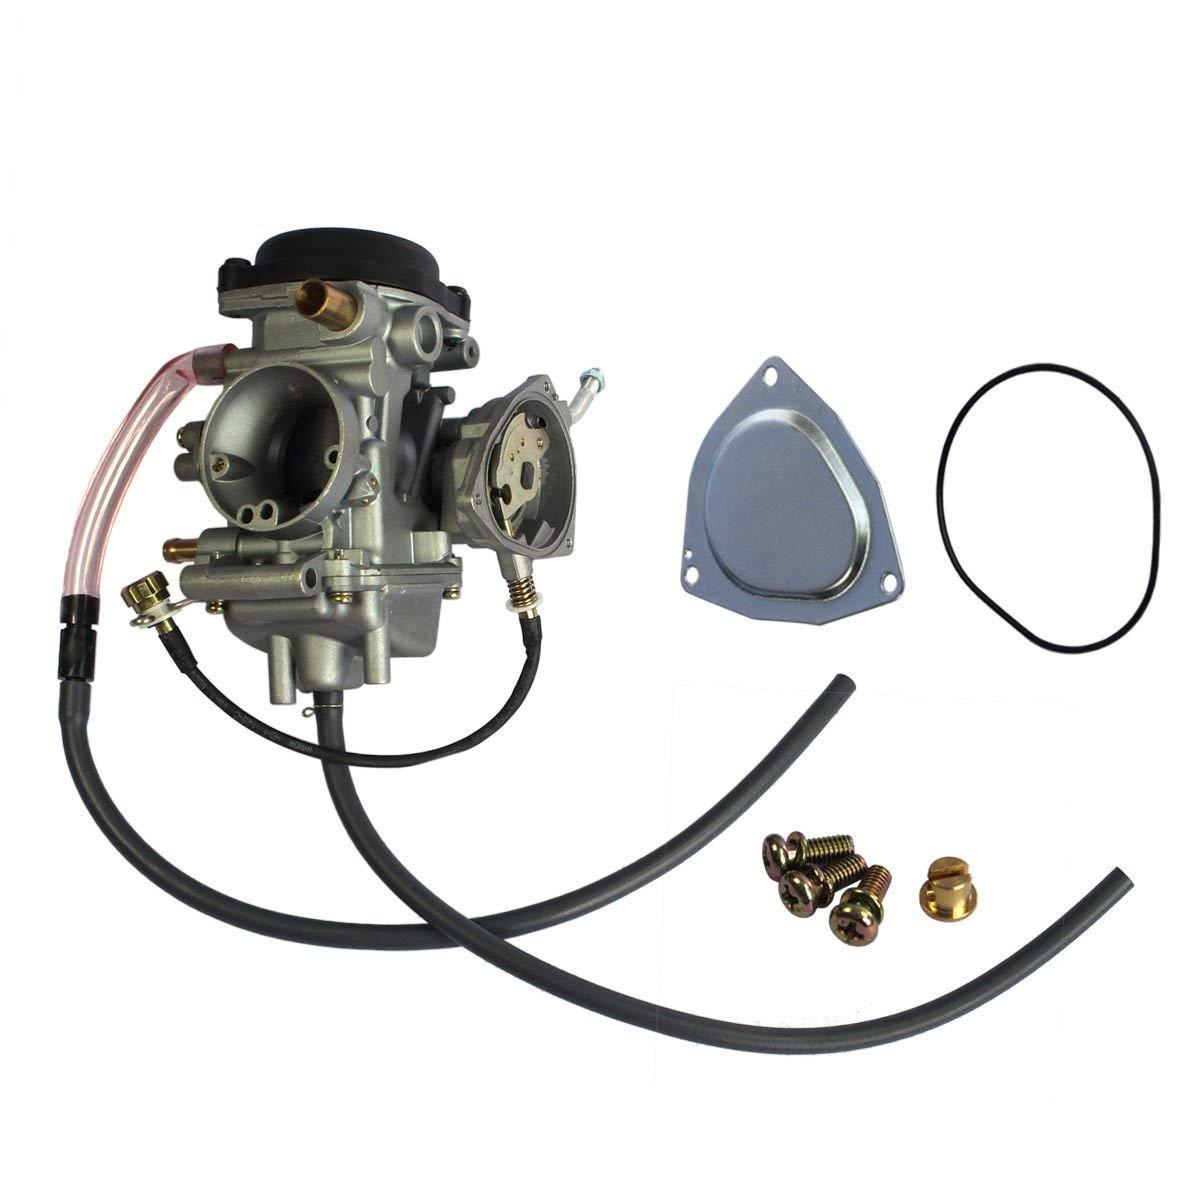 Performance Carburetor Fits Yamaha BIG BEAR 400 2x4 4x4 YFM400 2000 2001 2002 2003 2004 2005 2006 NEW Carb